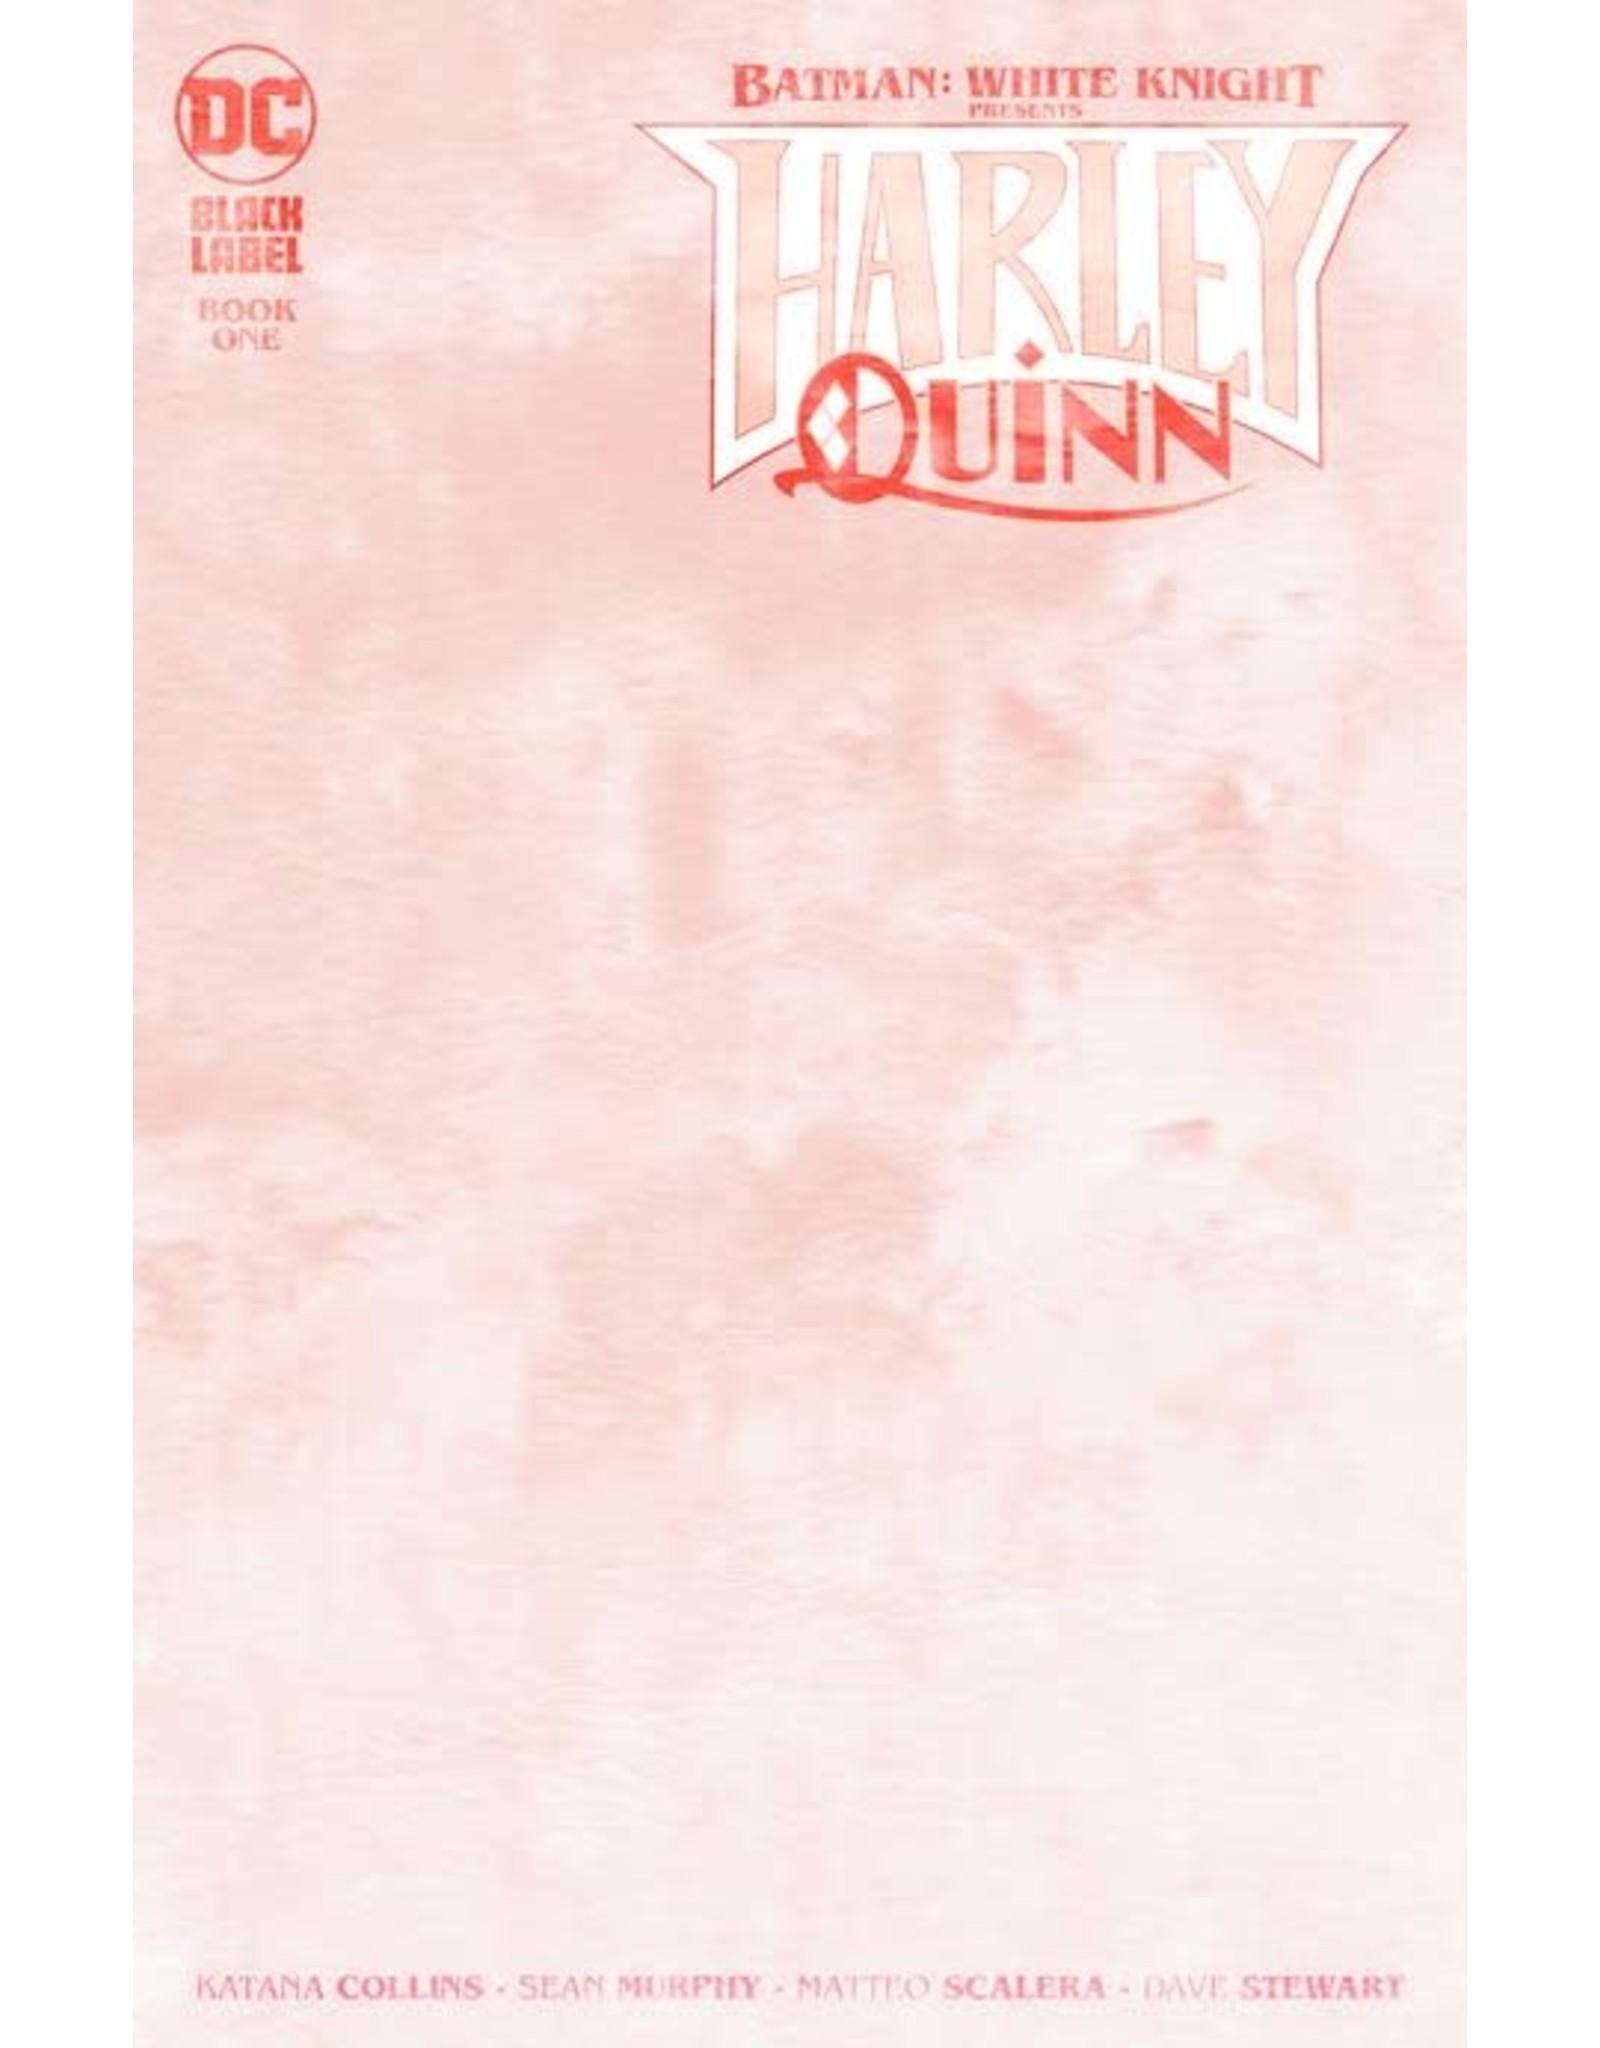 DC BATMAN WHITE KNIGHT PRESENTS HARLEY QUINN #1 (OF 6) CVR C BLANK VAR